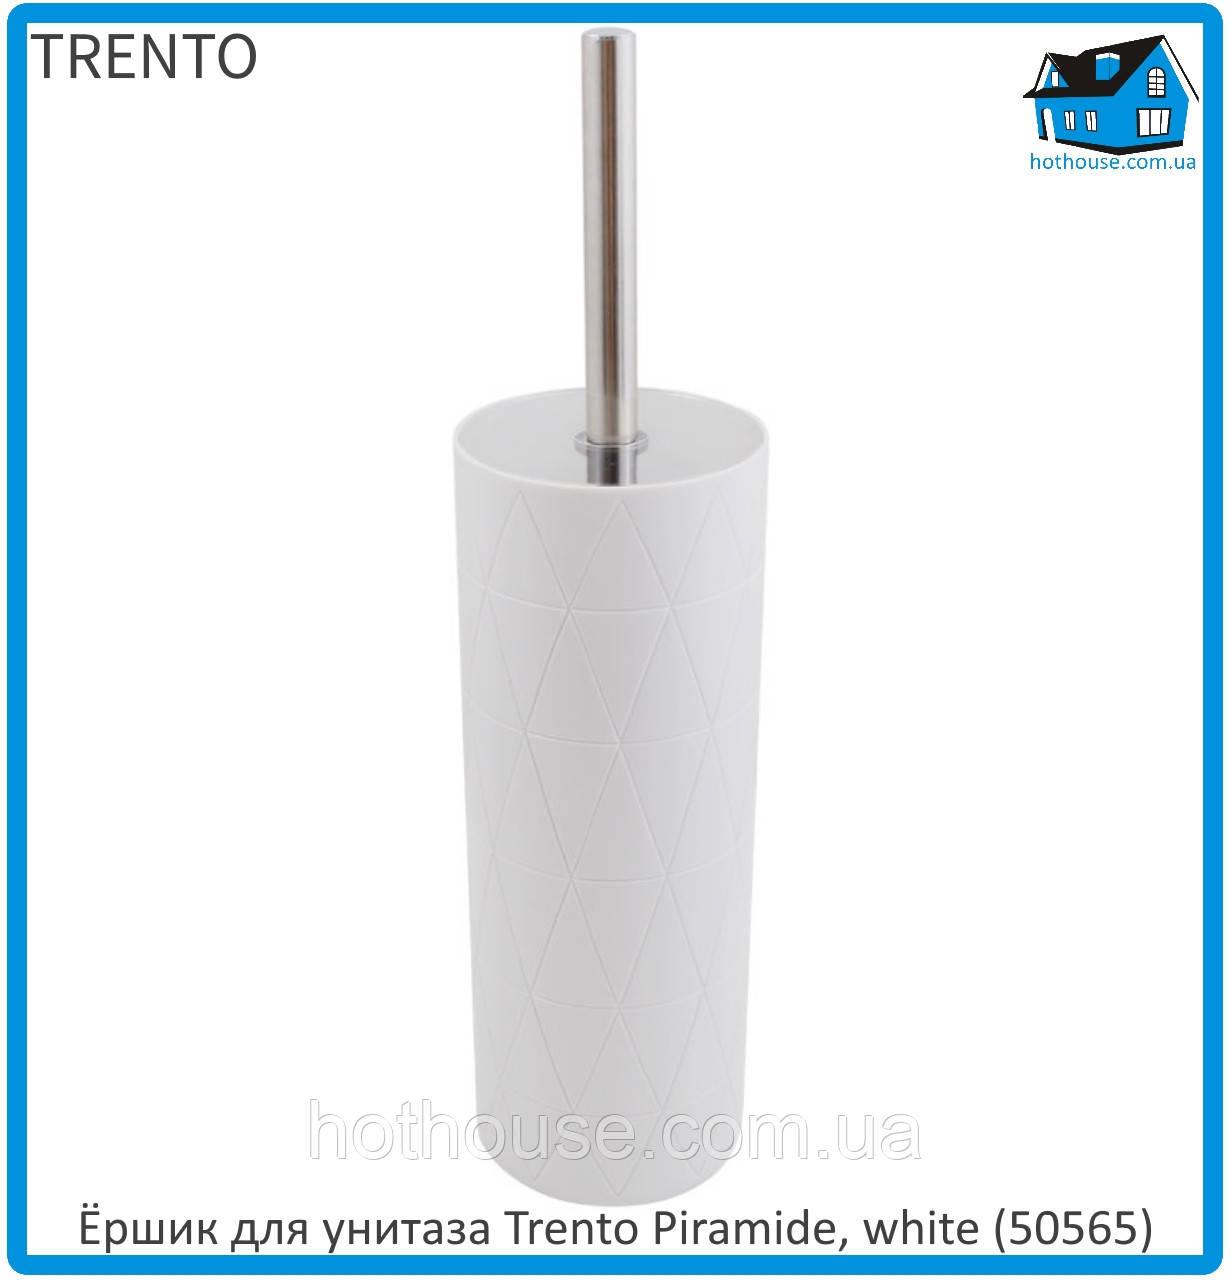 Йоршик для унітазу Trento Piramide, white (50565) 11